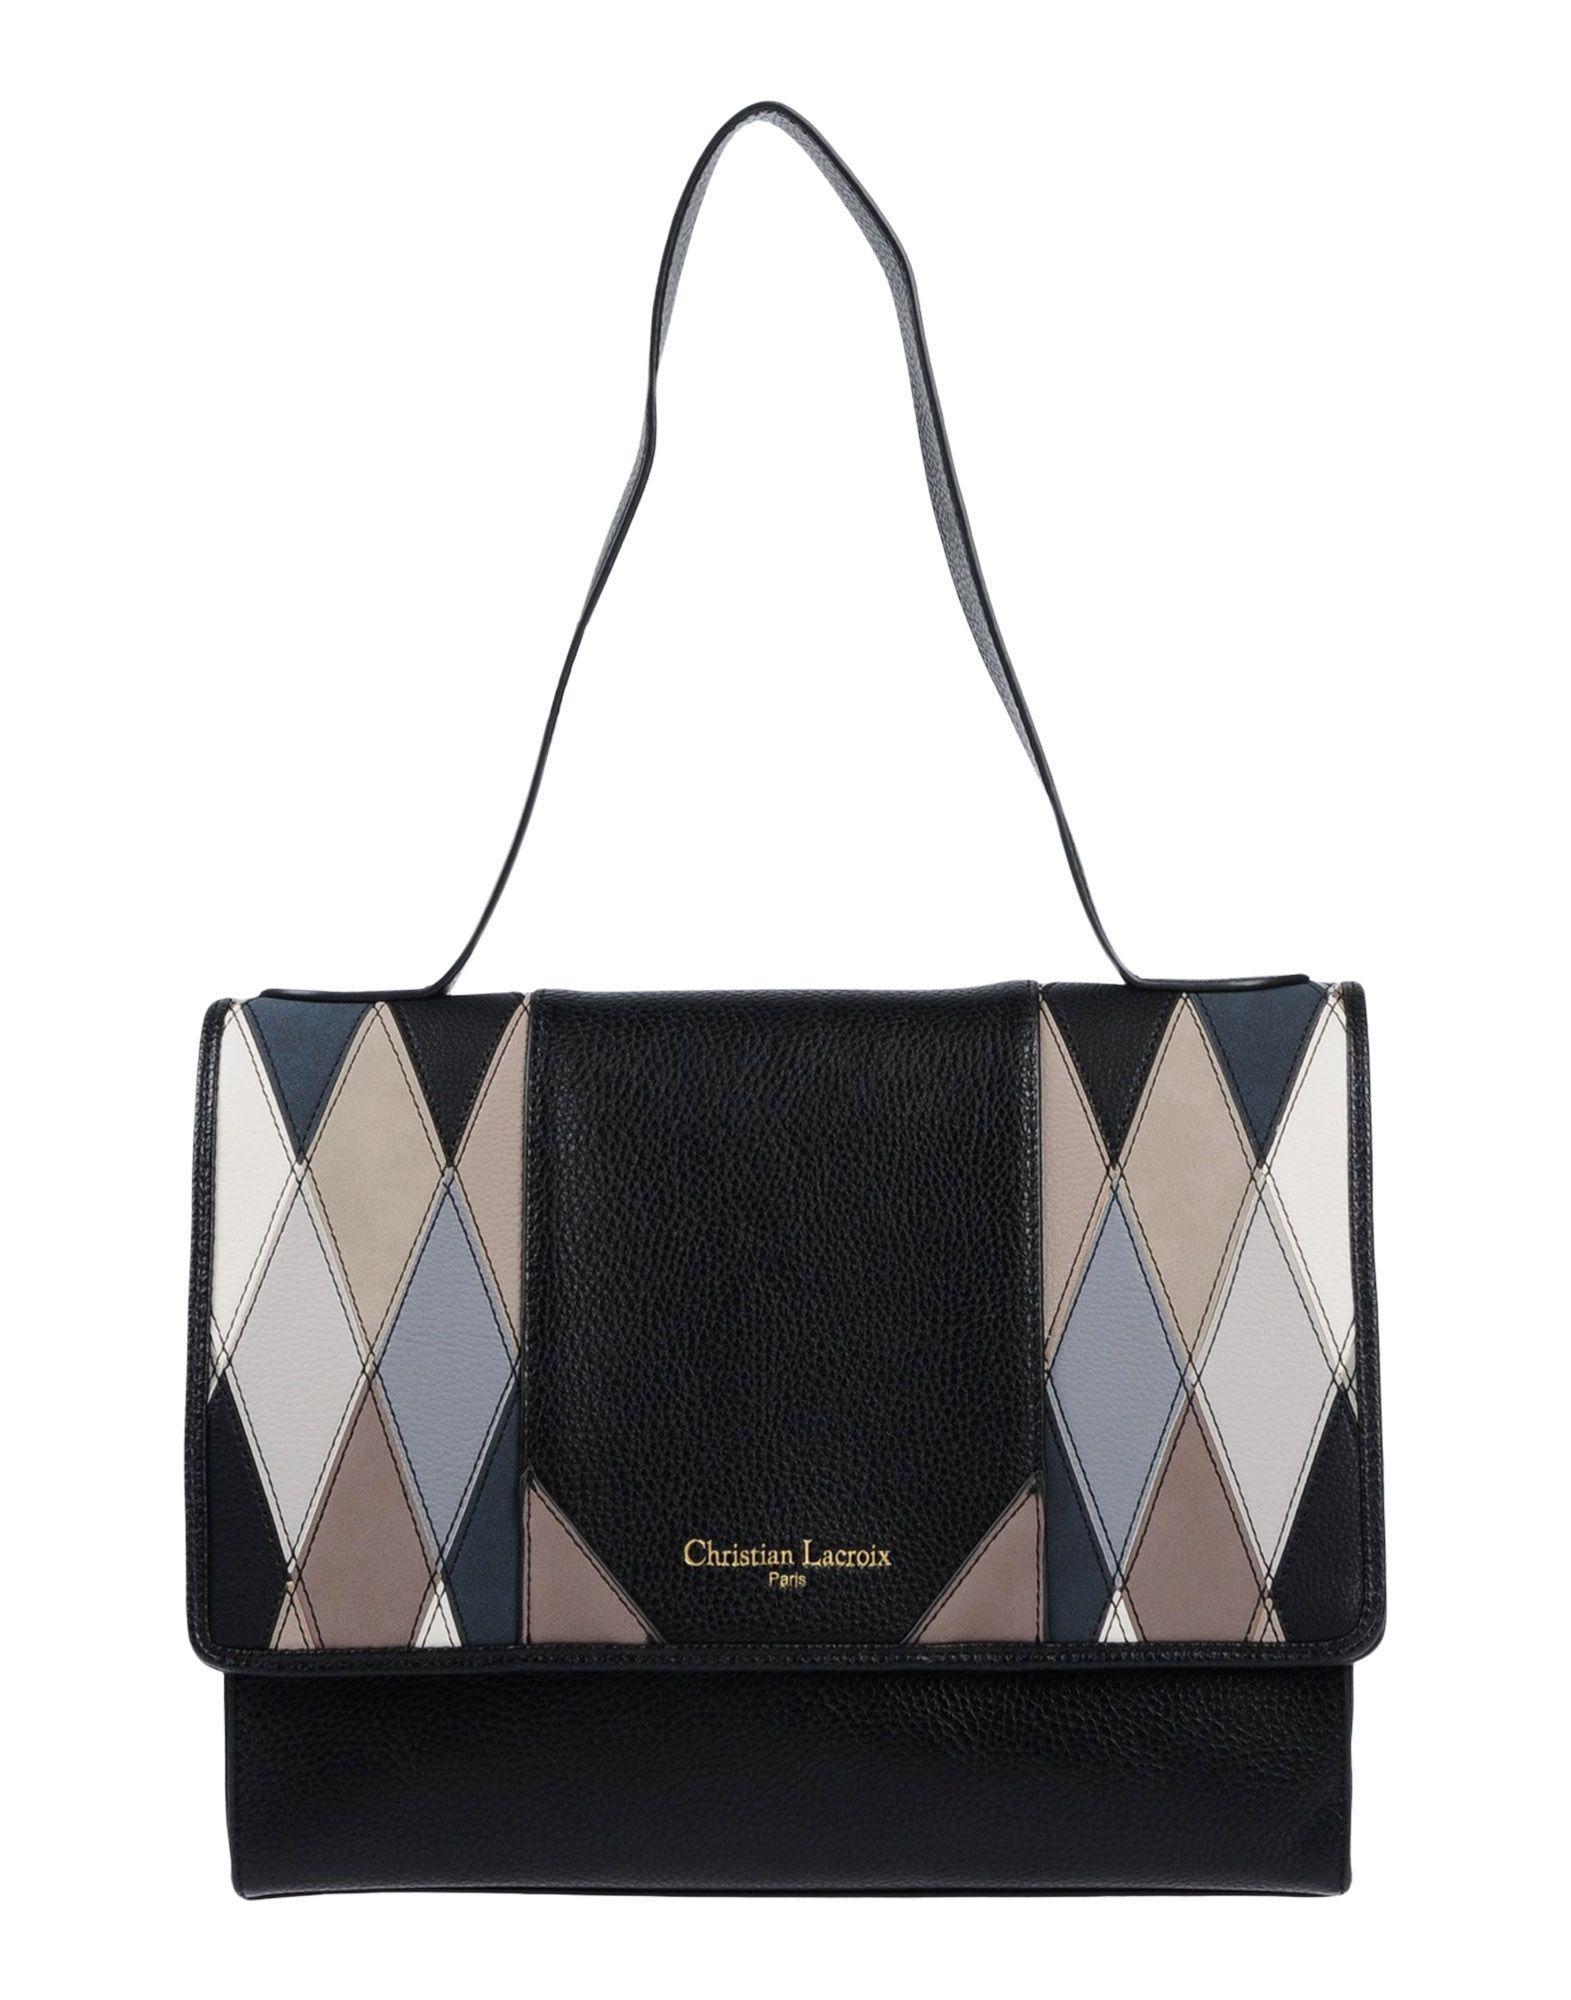 f49bb9fb2 Christian Lacroix Handbag In Black | ModeSens